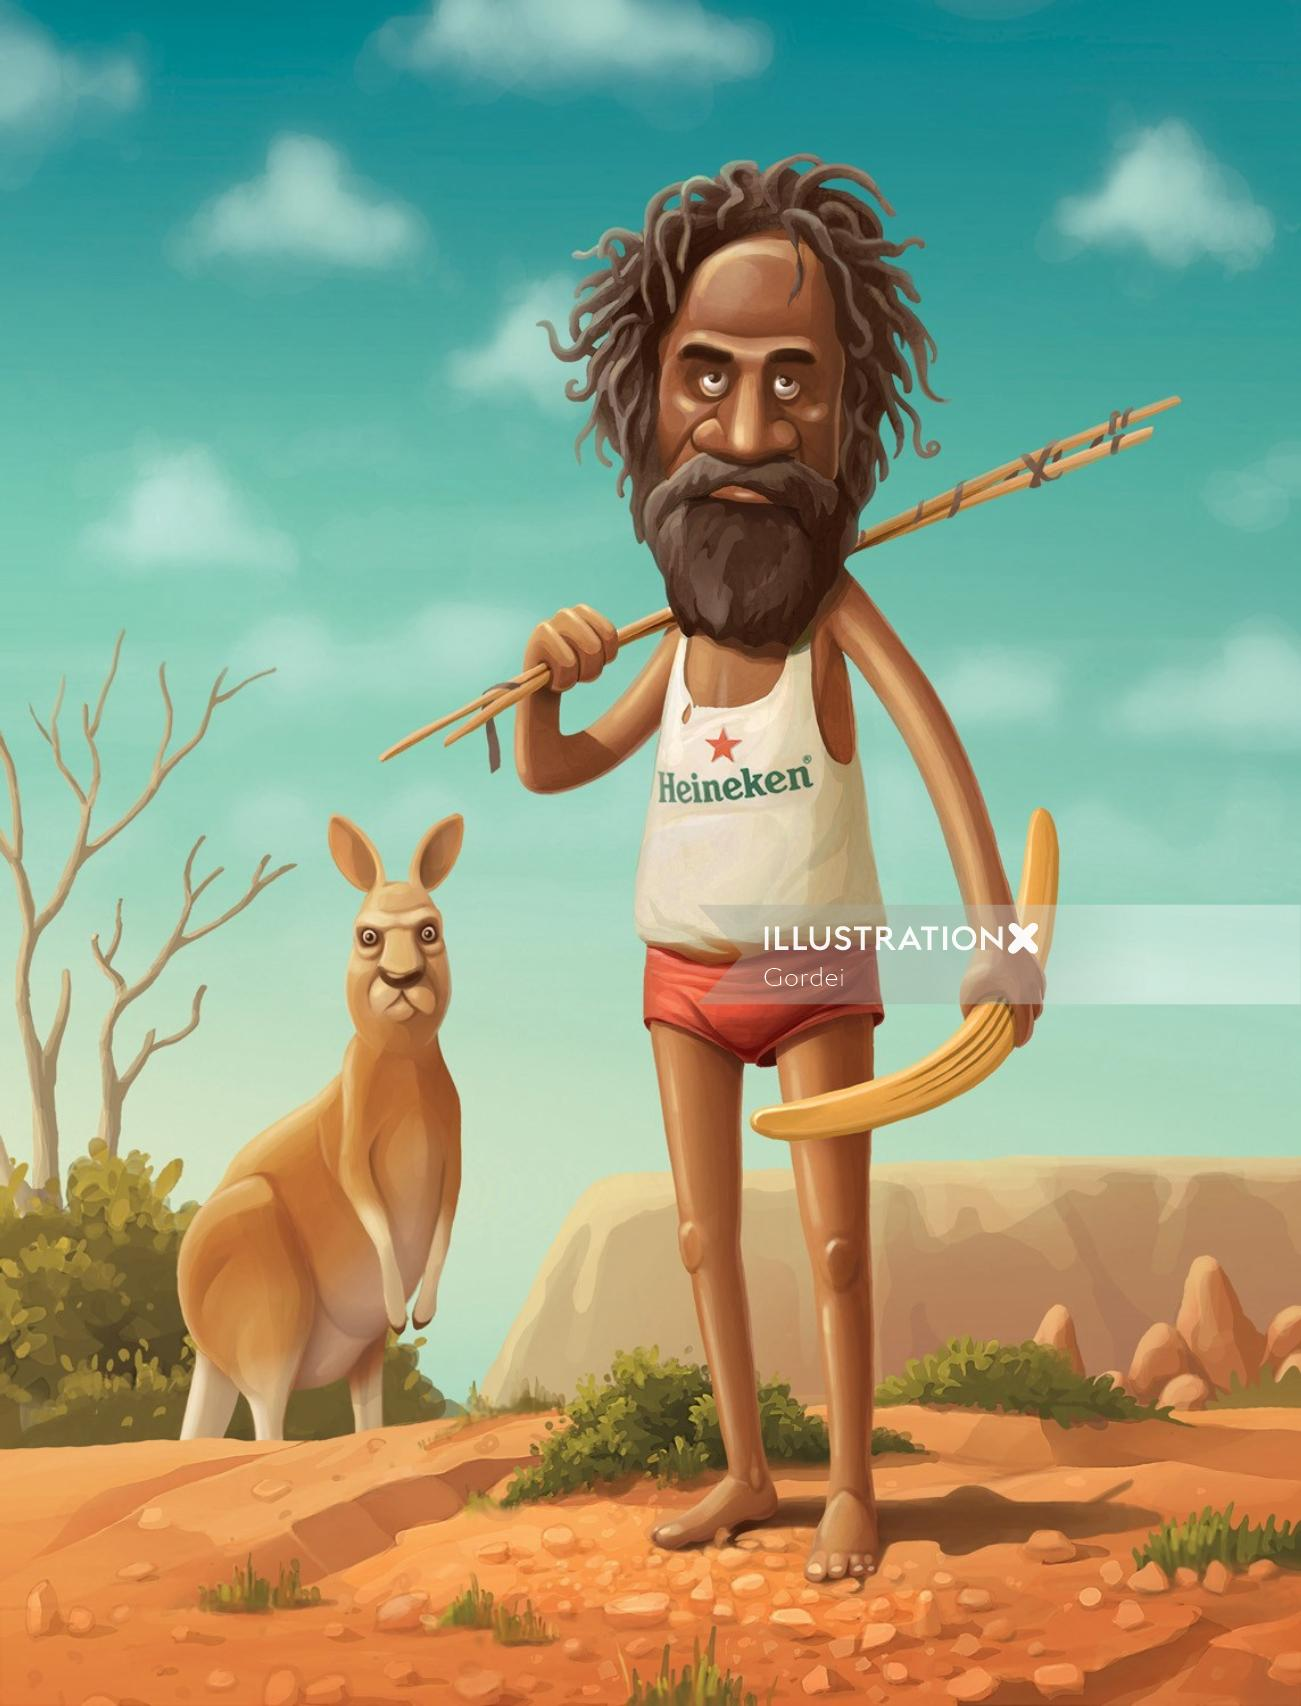 Watercolour Art Of Man and Kangaroo